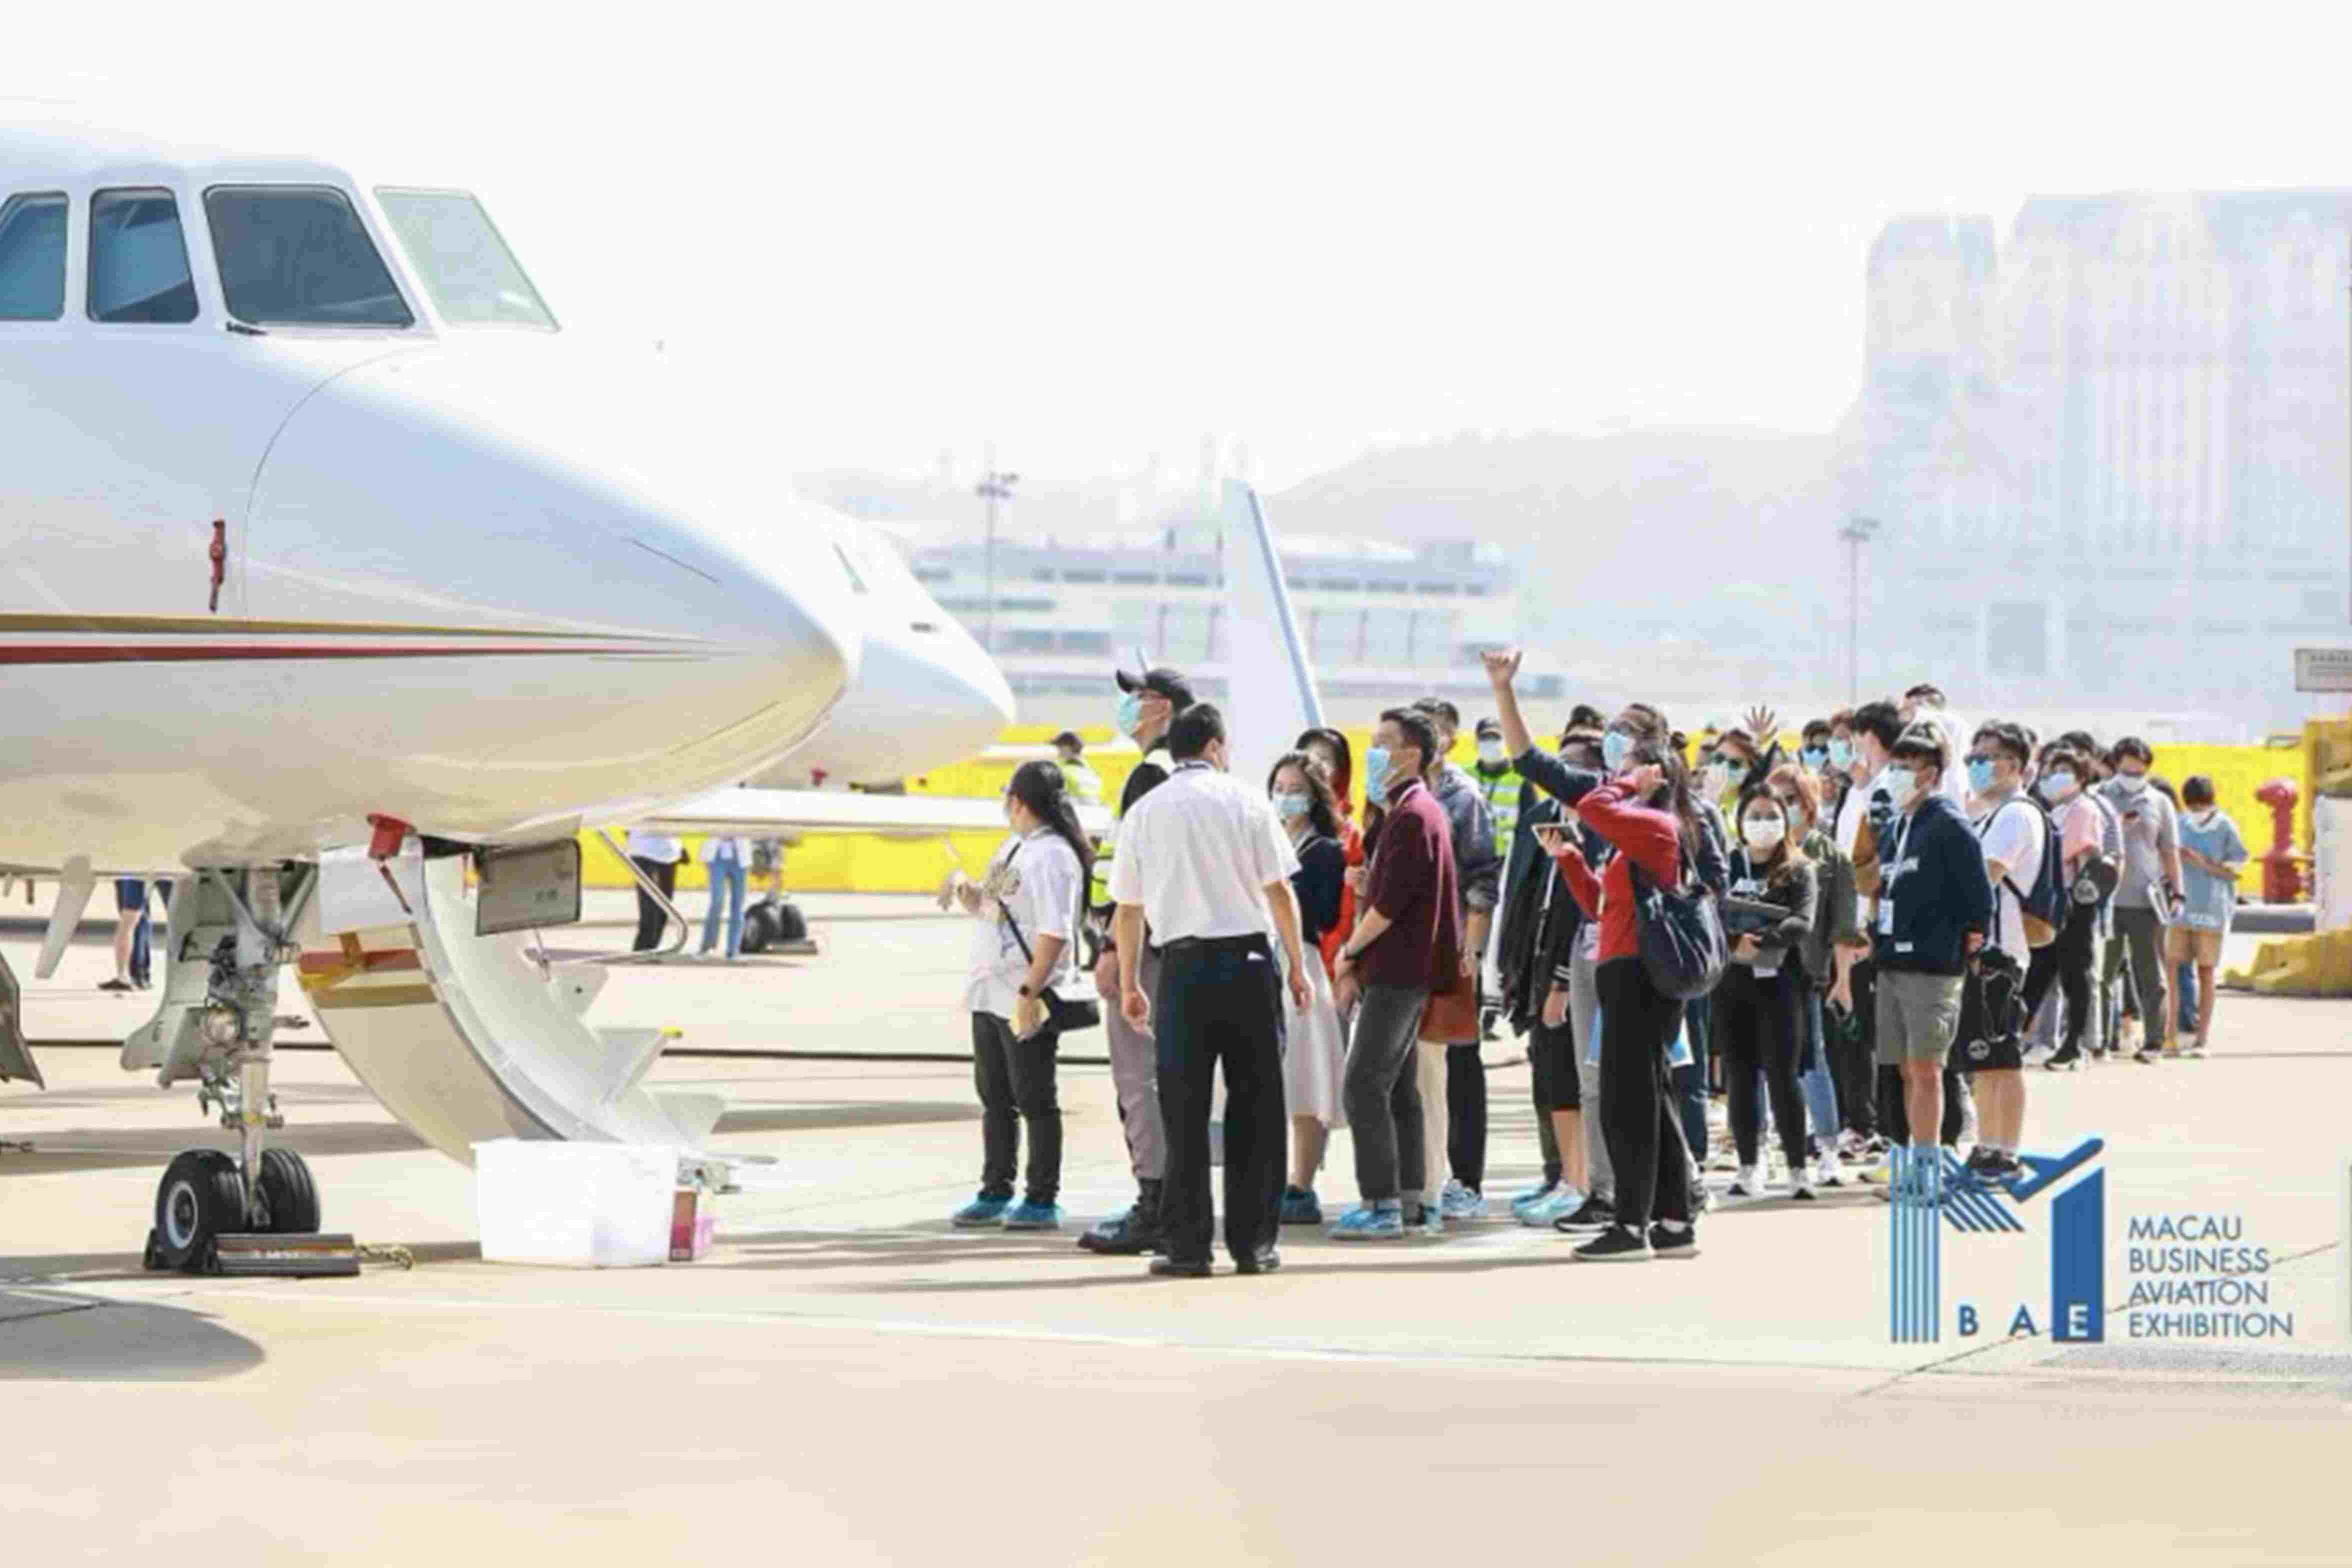 TAG Macau FBO is exclusive FBO for the 2021 Macau Business Aviation Exhibition